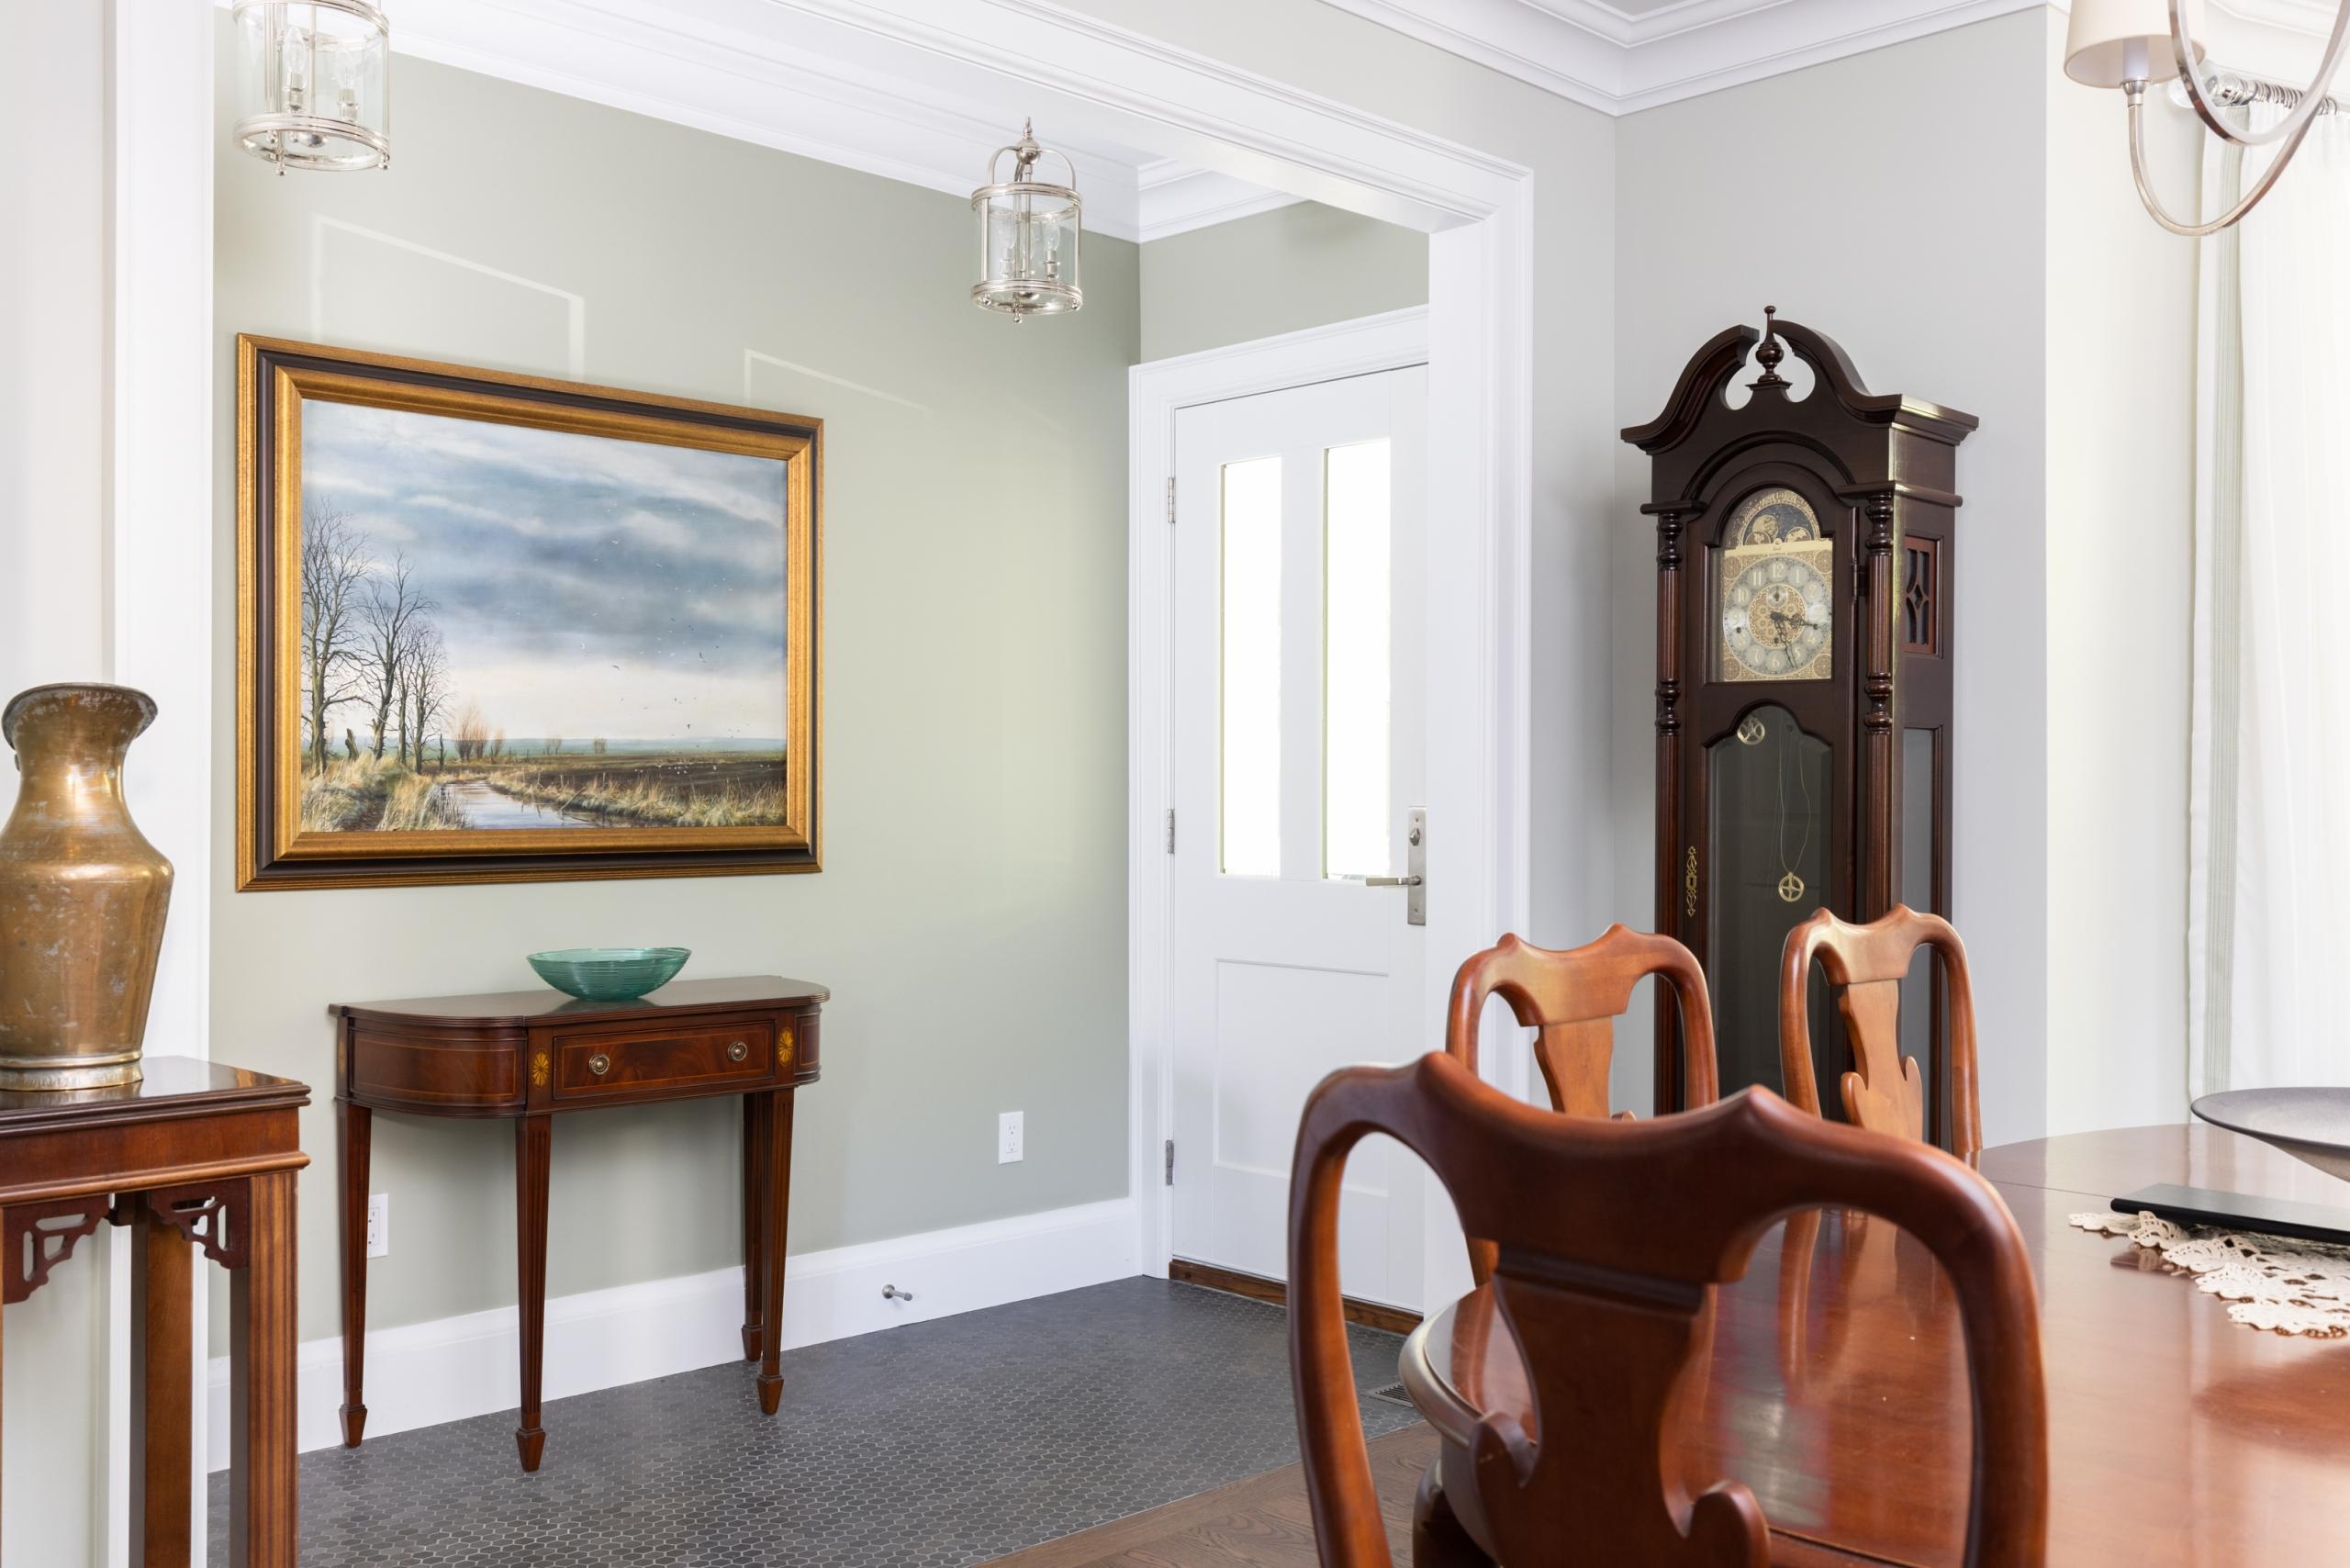 Dining room featured at 295 William Street, Oakville. Alex Irish & Associates